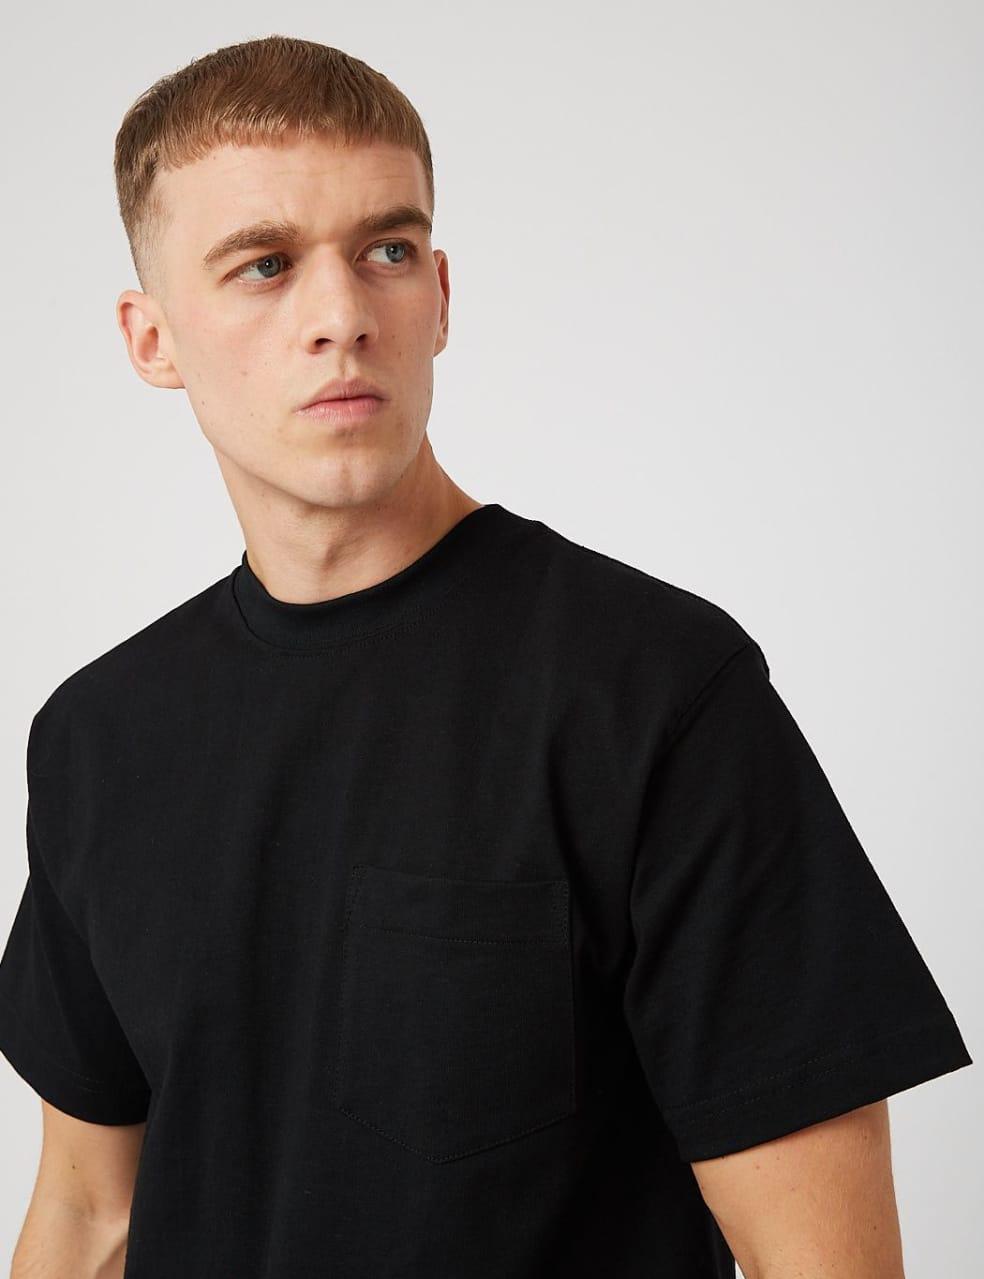 Camber Pocket T-shirt (8oz) - Black | T-Shirt by Camber USA 2